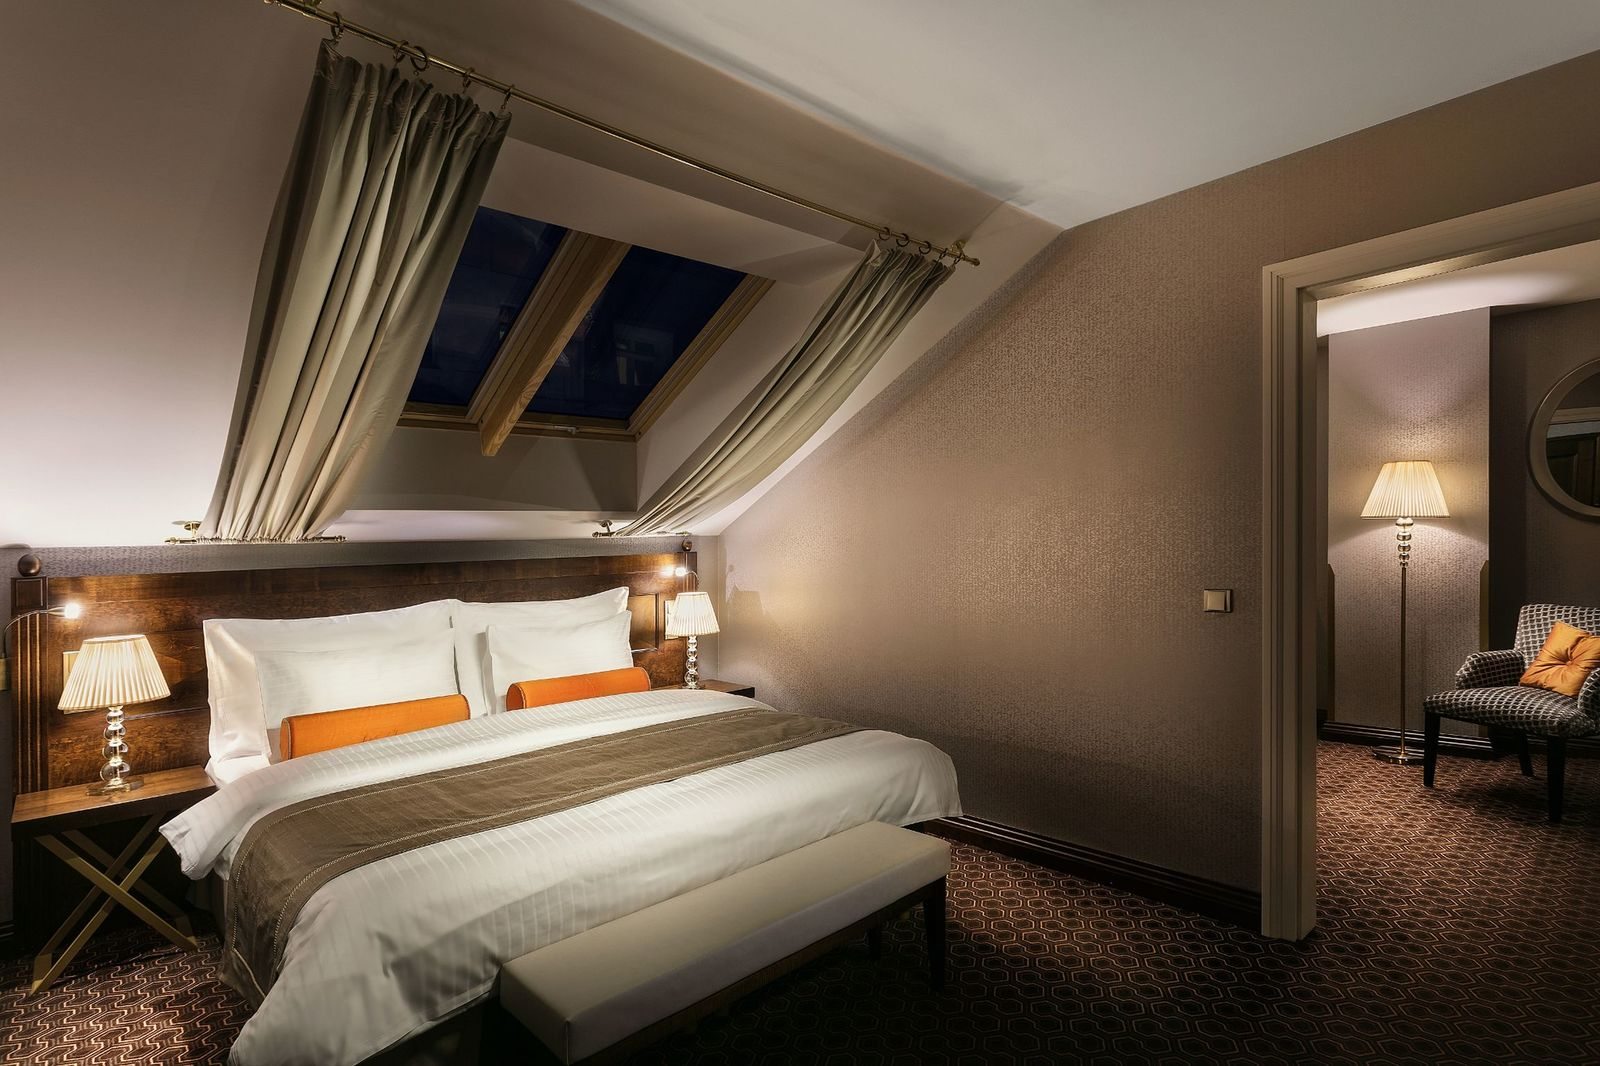 Martini Bedroom Suite Rooms Suites Cosmopolitan Hotel